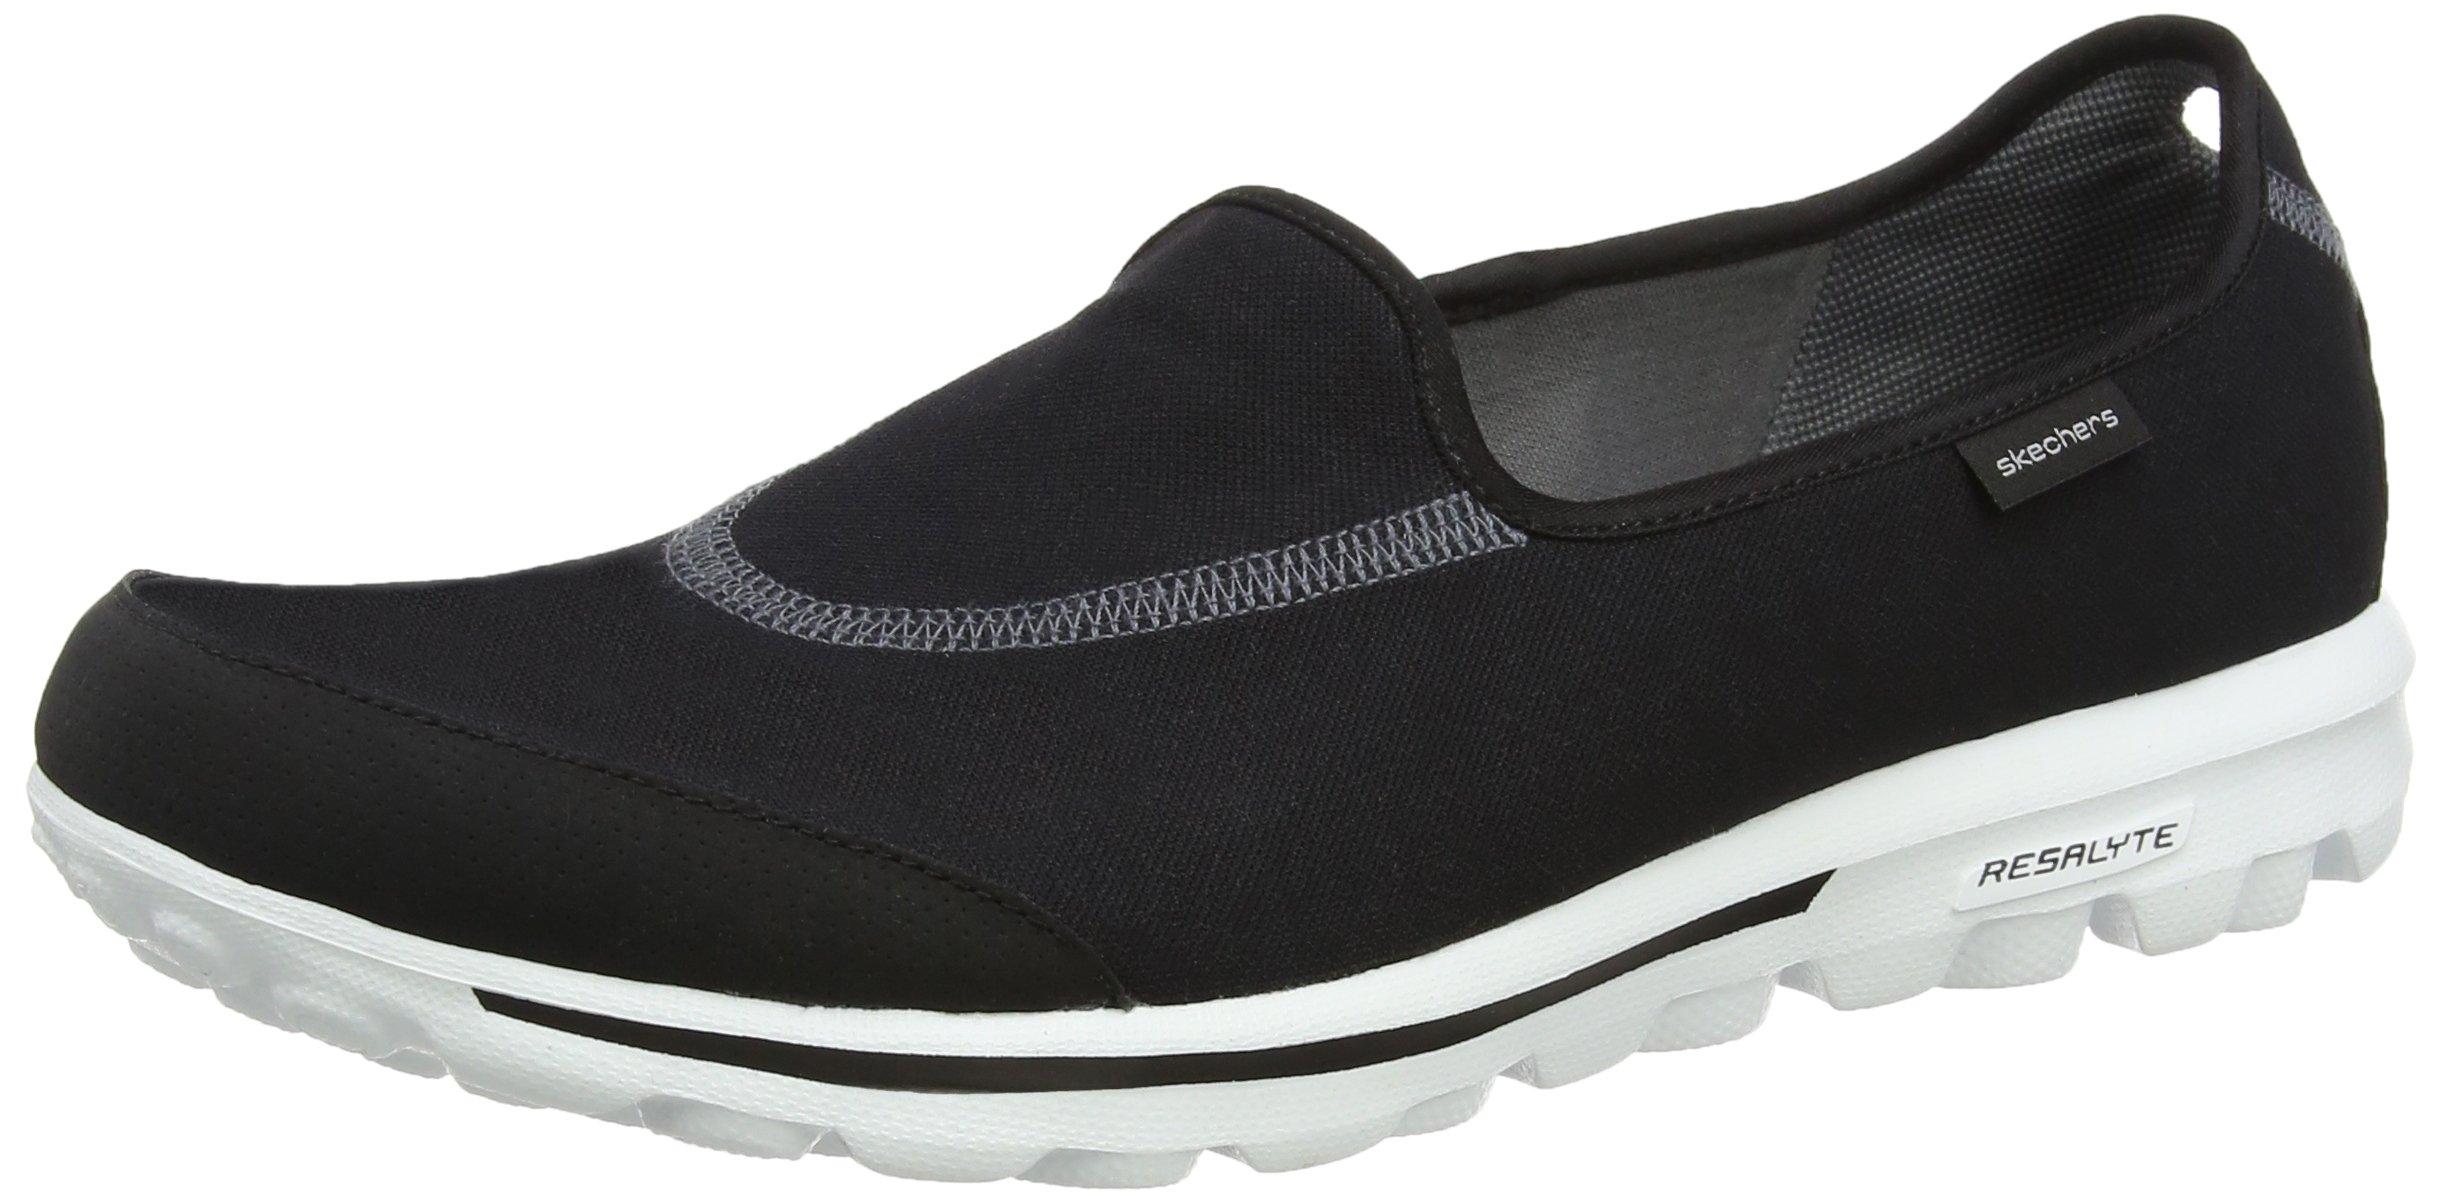 1ce8e97eef2d Get Quotations · Skechers Performance Women s Go Walk Slip-On Walking Shoe